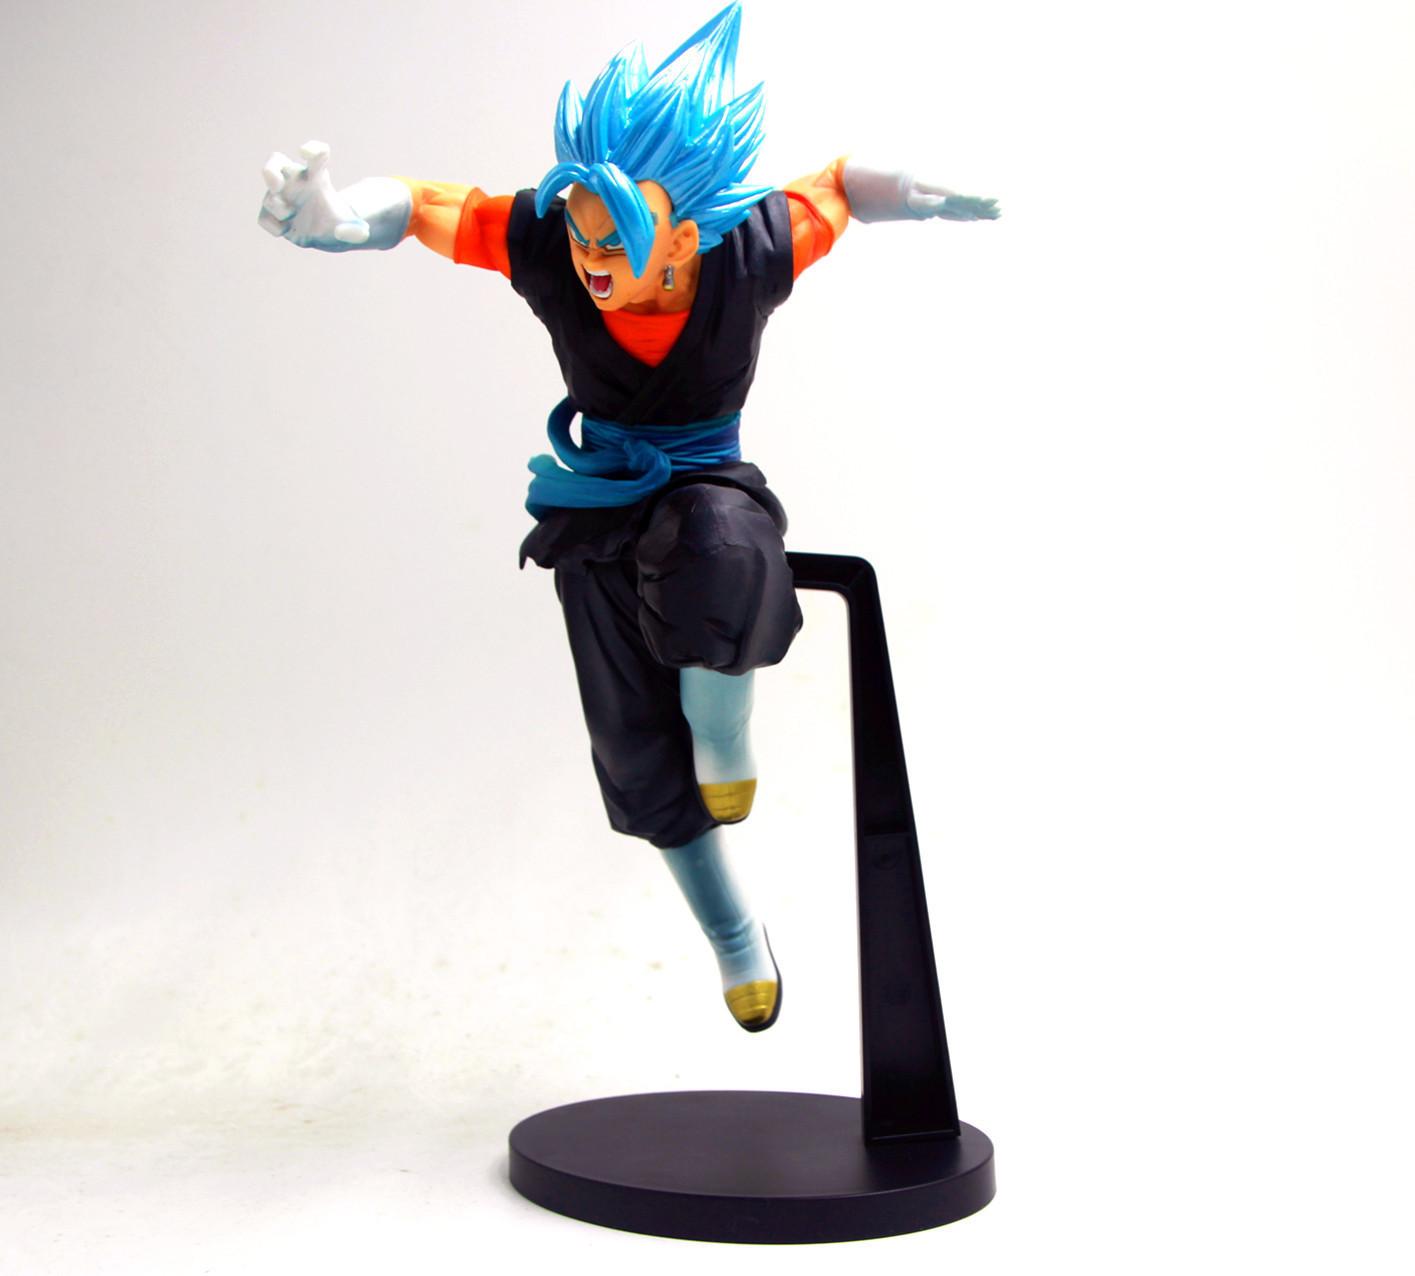 Anime Cosplay Grasa Negro PVC Figure Figuras Muñeca Man Estatuilla De Juguete Regalo